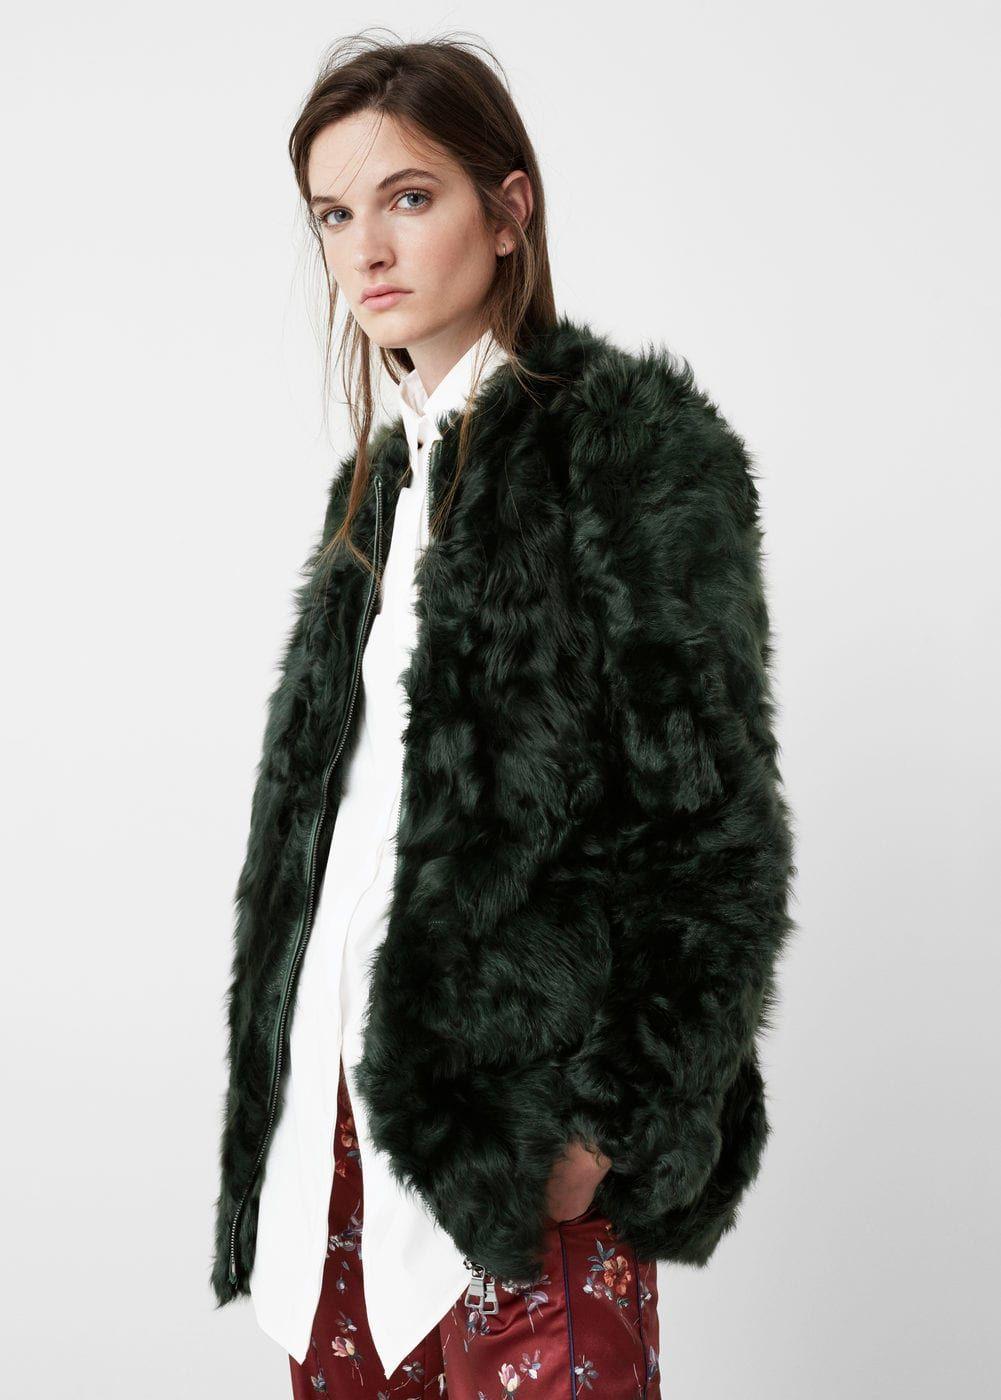 manteau cuir fourrure femme wish list veste fourrure. Black Bedroom Furniture Sets. Home Design Ideas